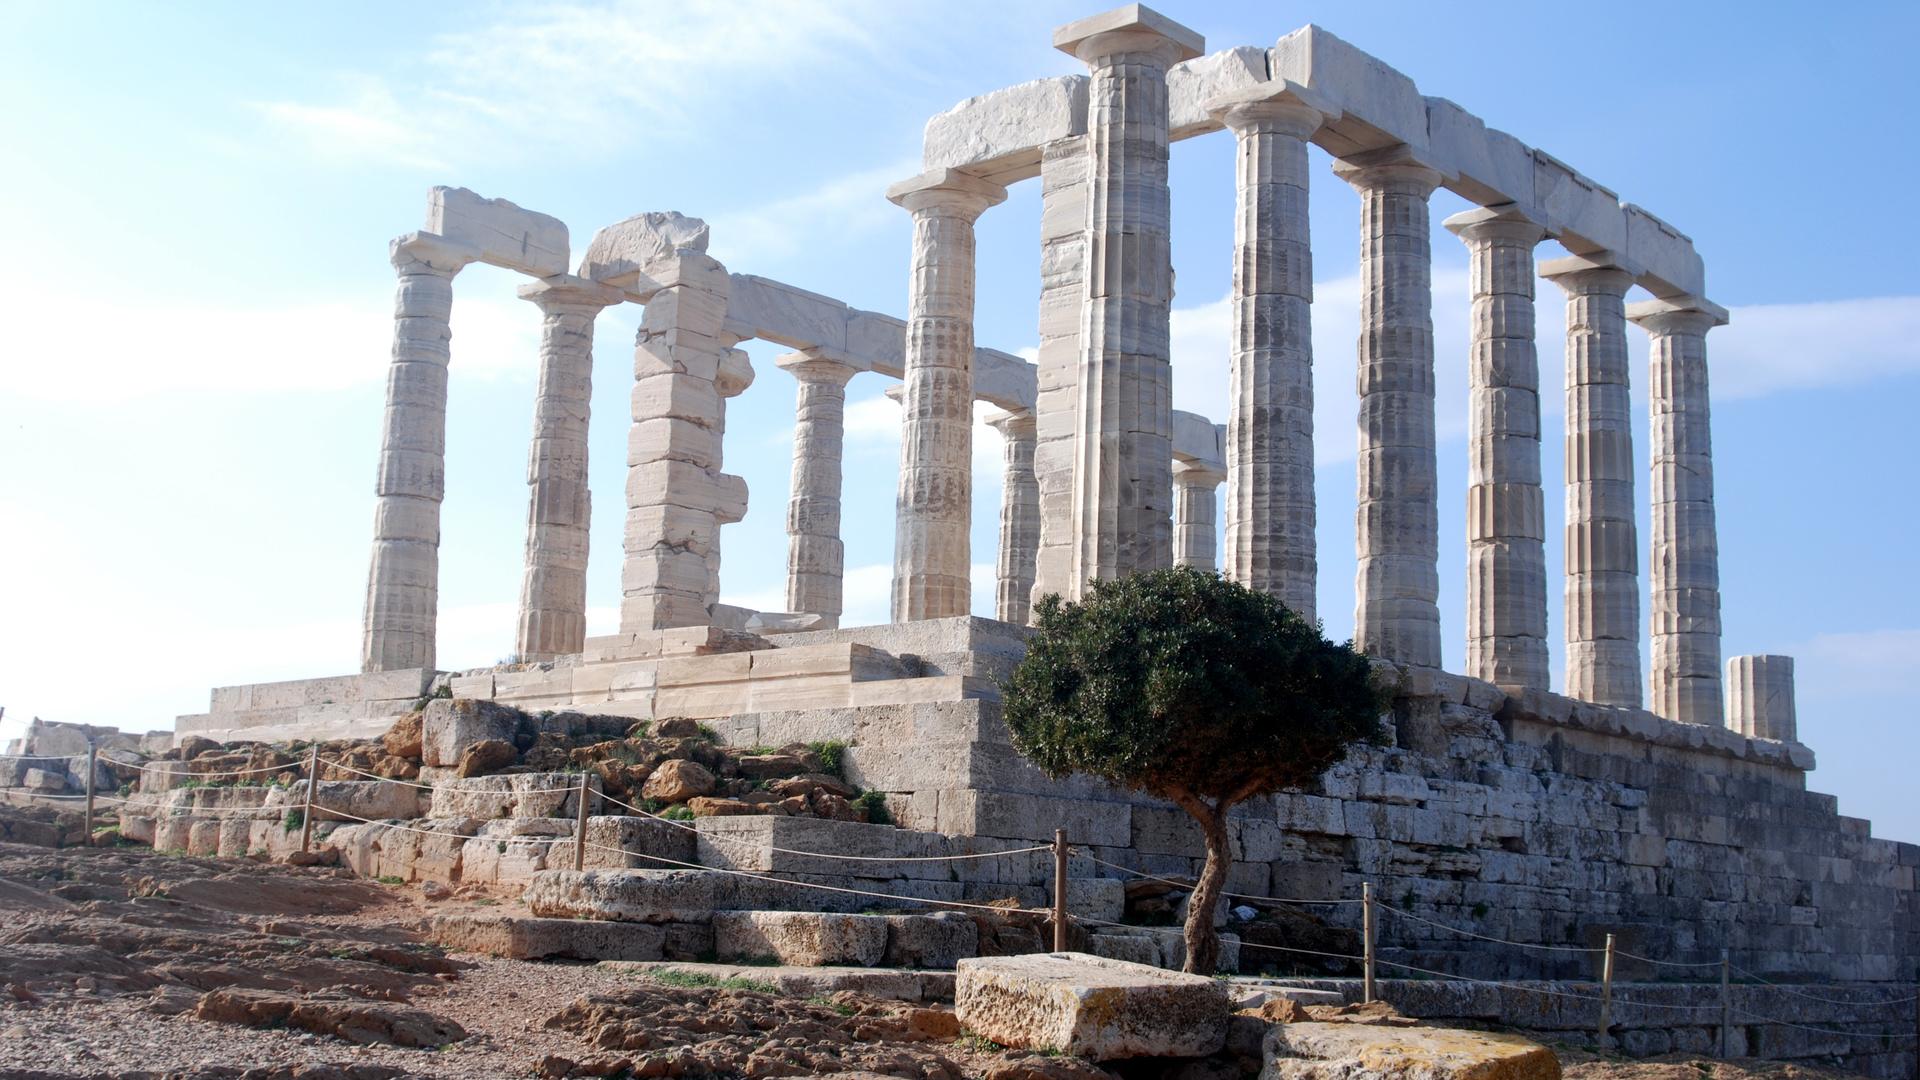 афины, греция, столб, крушение, камень, храм, храм посейдона